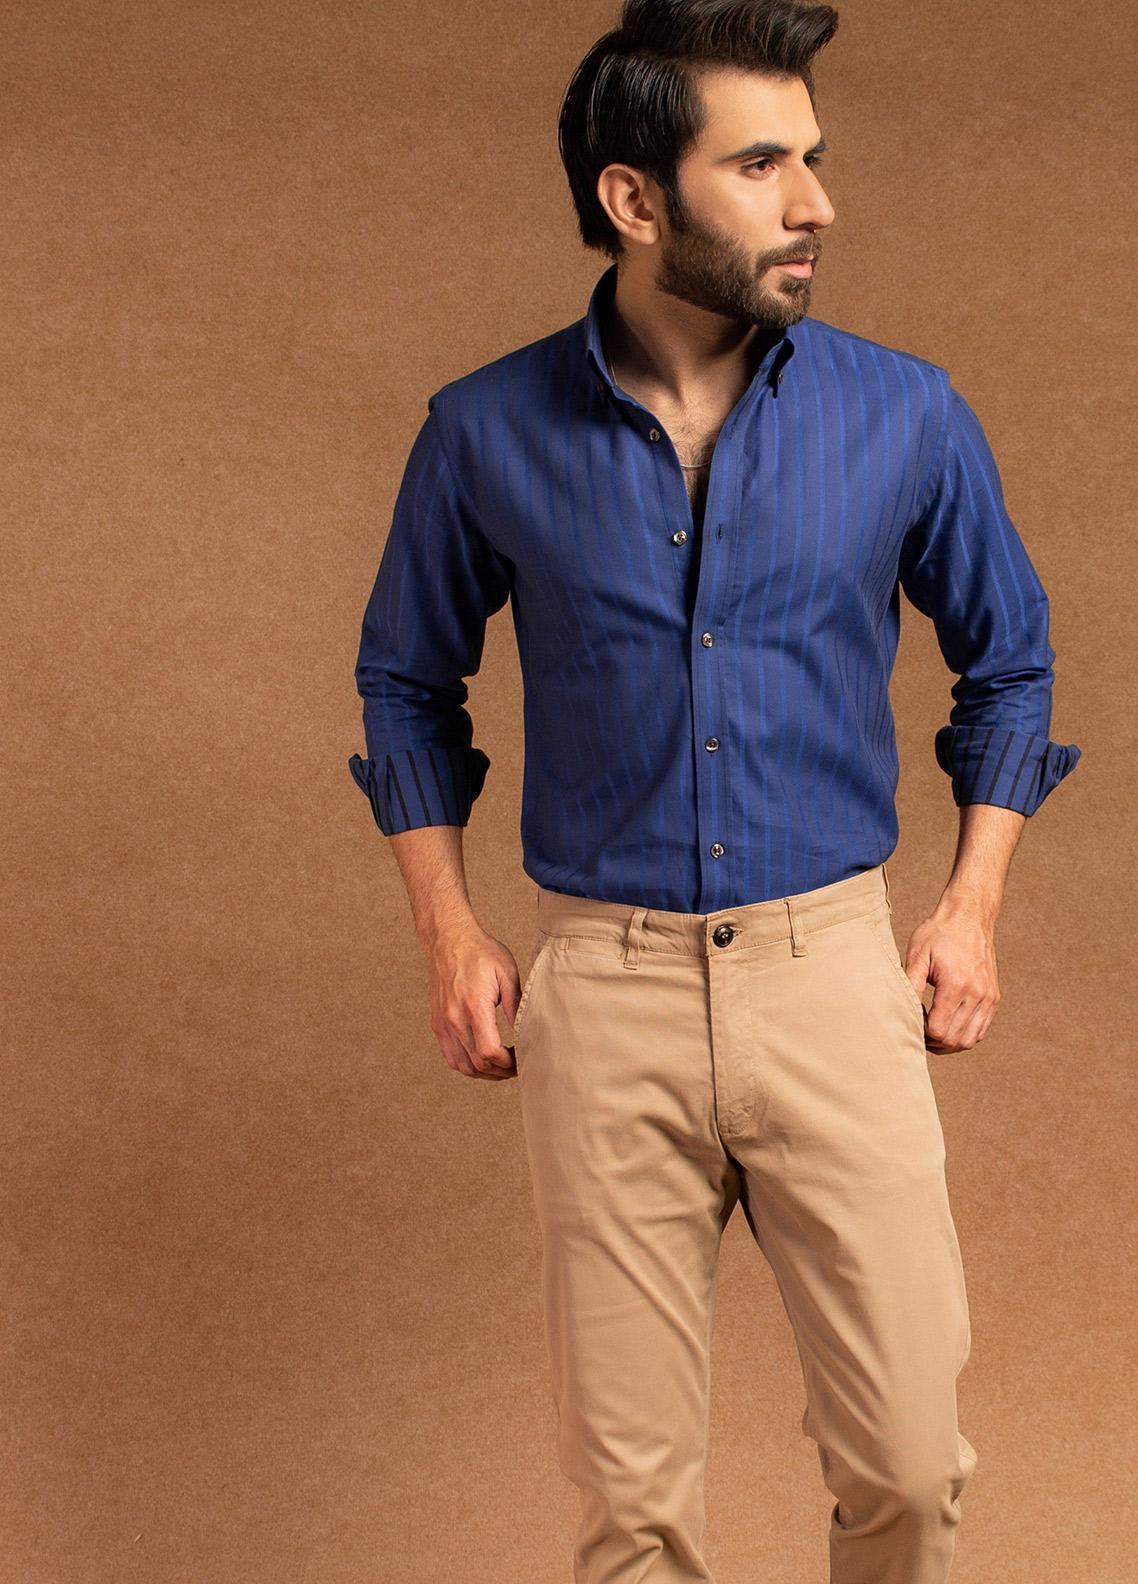 Brumano Cotton Formal Men Shirts - Navy Blue BRM-646